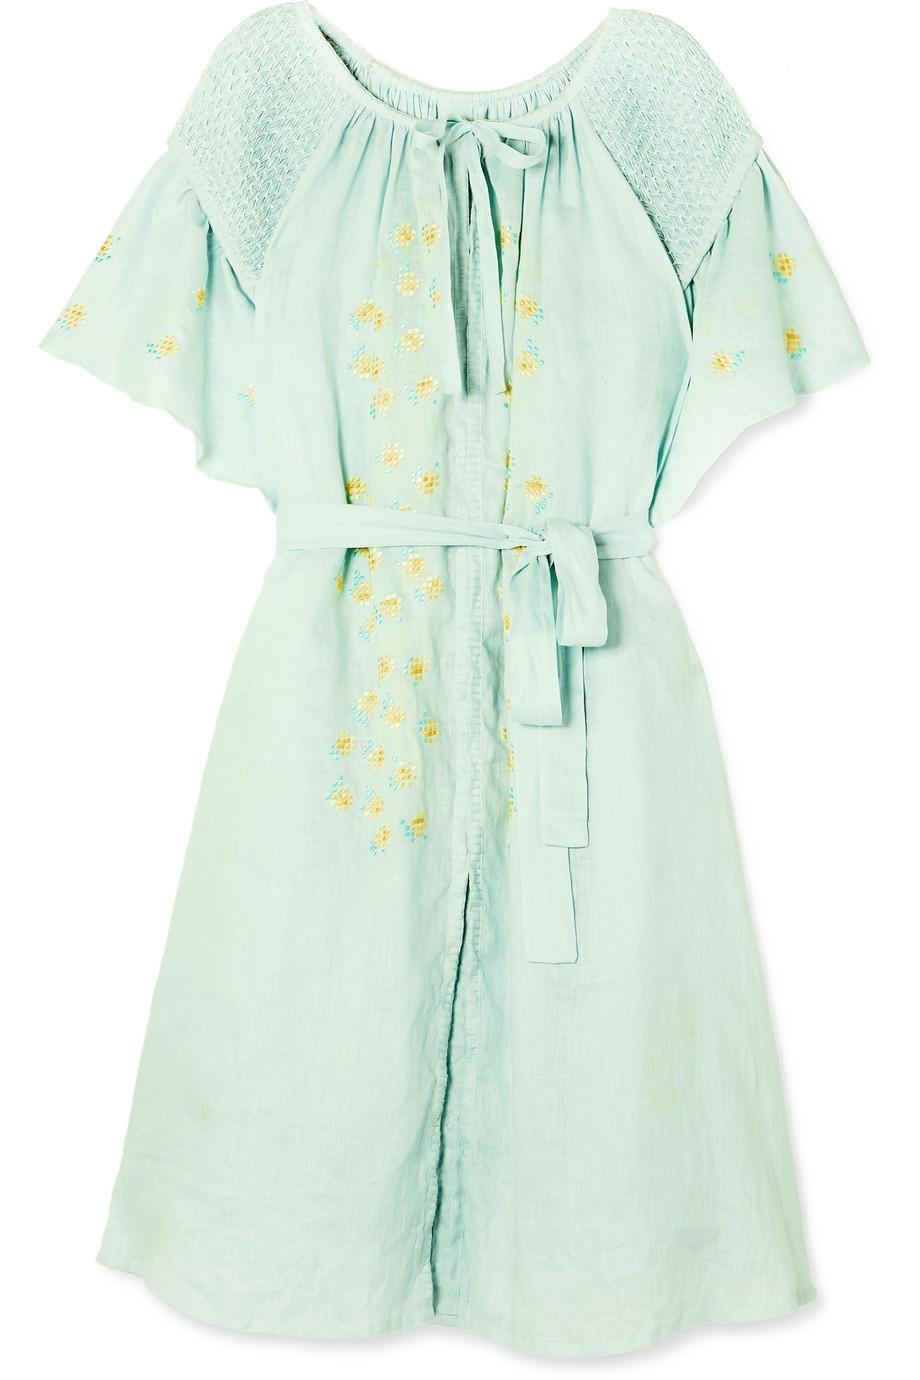 81059288cbb Innika Choo Hugh Jesmok smocked embroidered linen dress